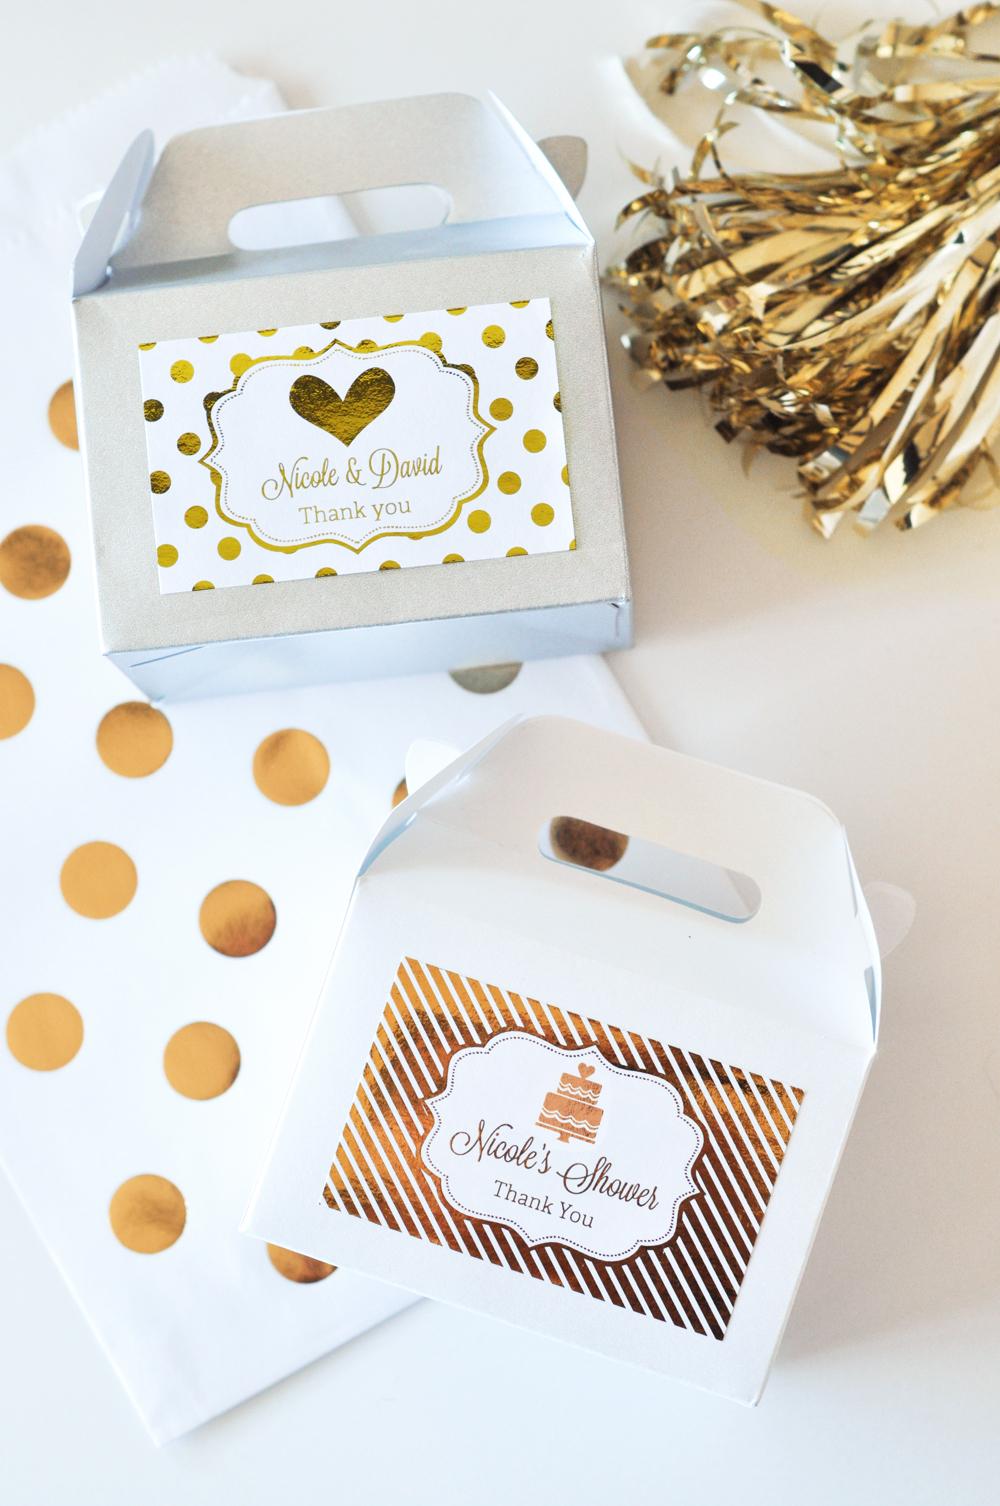 Personalized Mini Gable Boxes (set of 12) - Metallic Foil